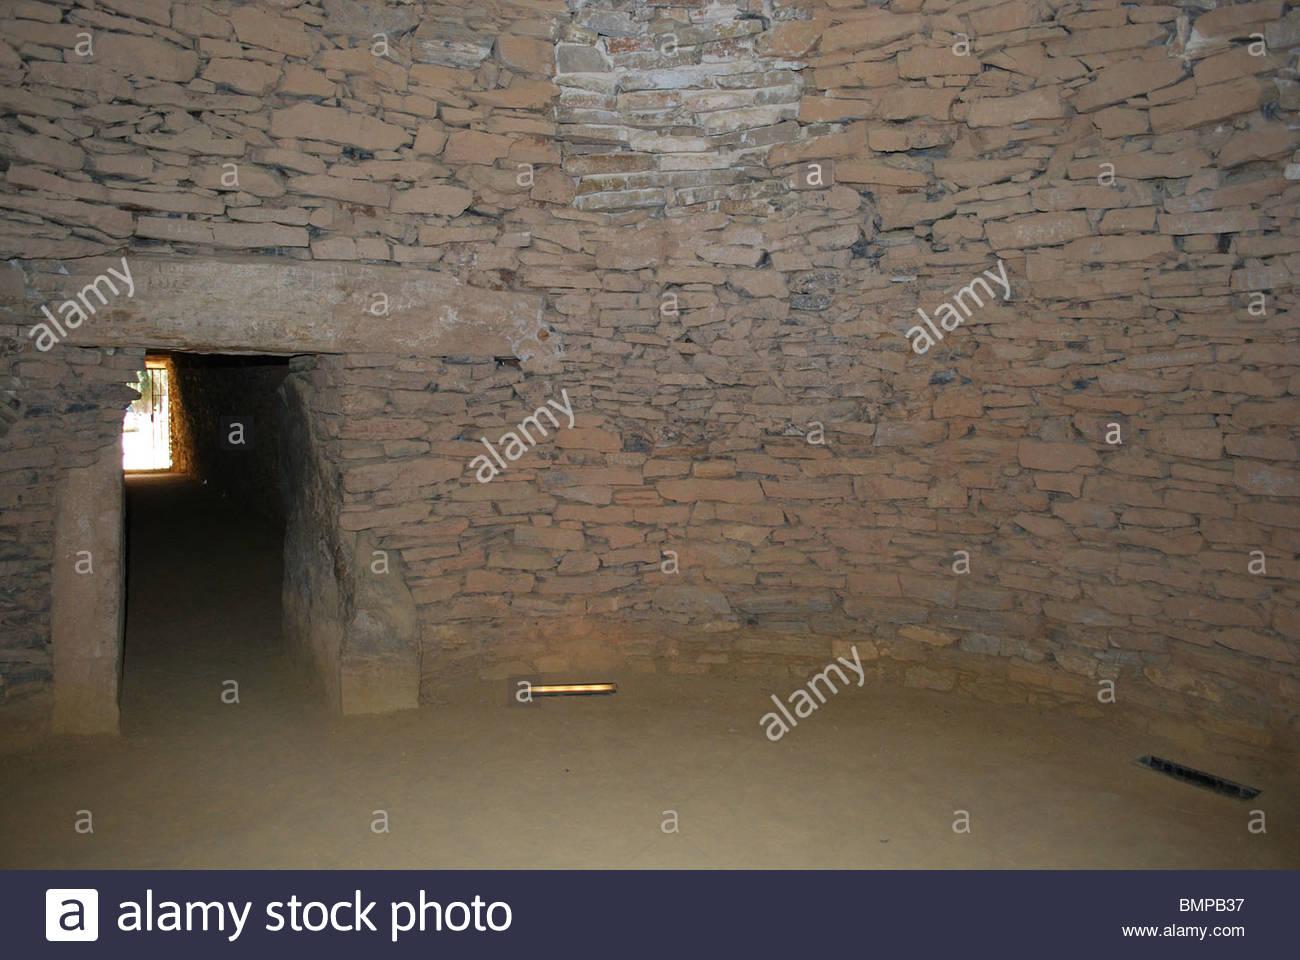 Main room, Dolmen de Romeral, The Dolmens, Antequera, Malaga Province, Andalucia, Spain, Western Europe. - Stock Image